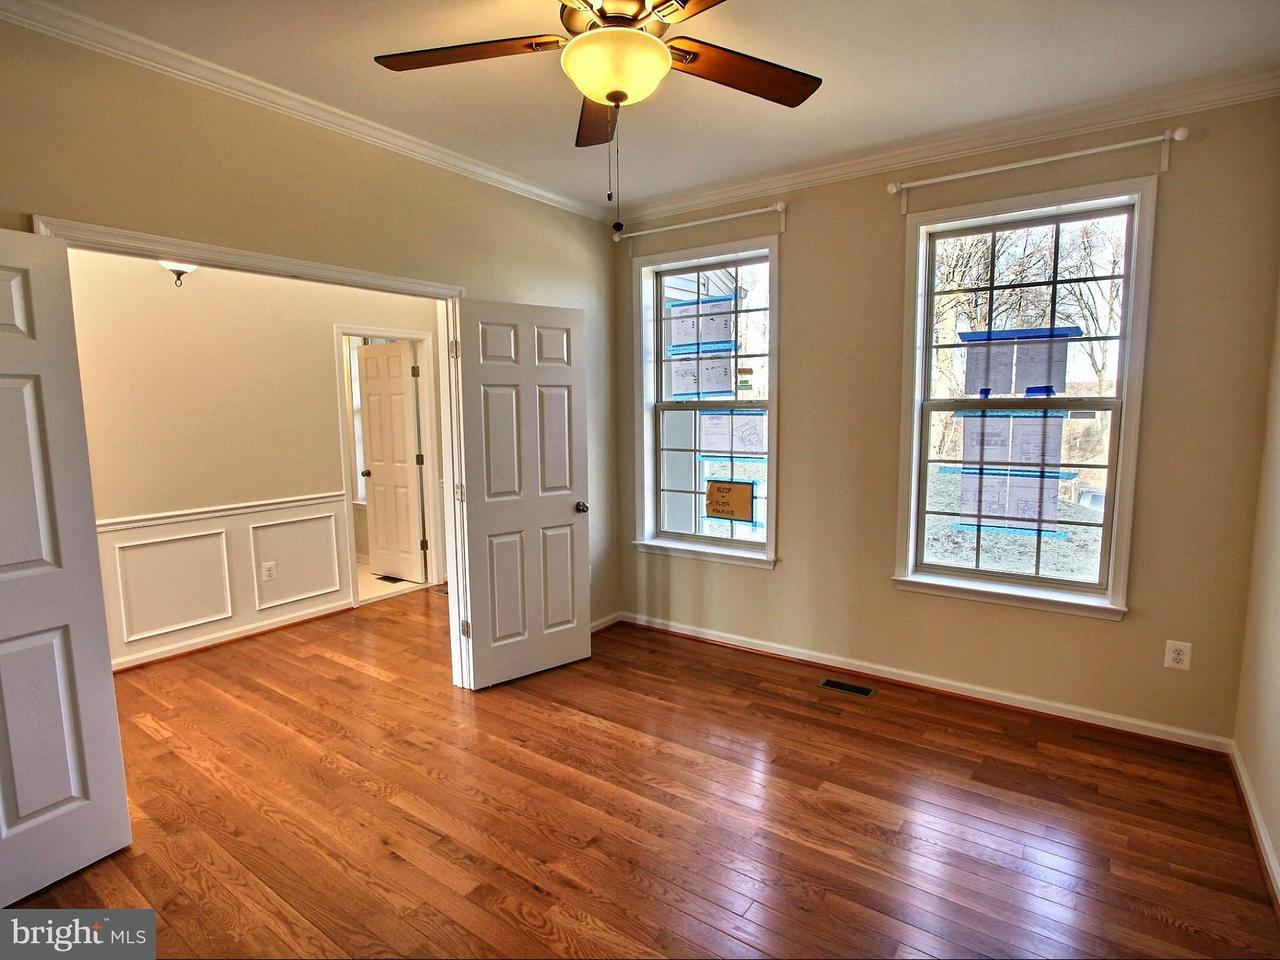 Additional photo for property listing at 9612 Woodland Road 9612 Woodland Road New Market, Мэриленд 21774 Соединенные Штаты